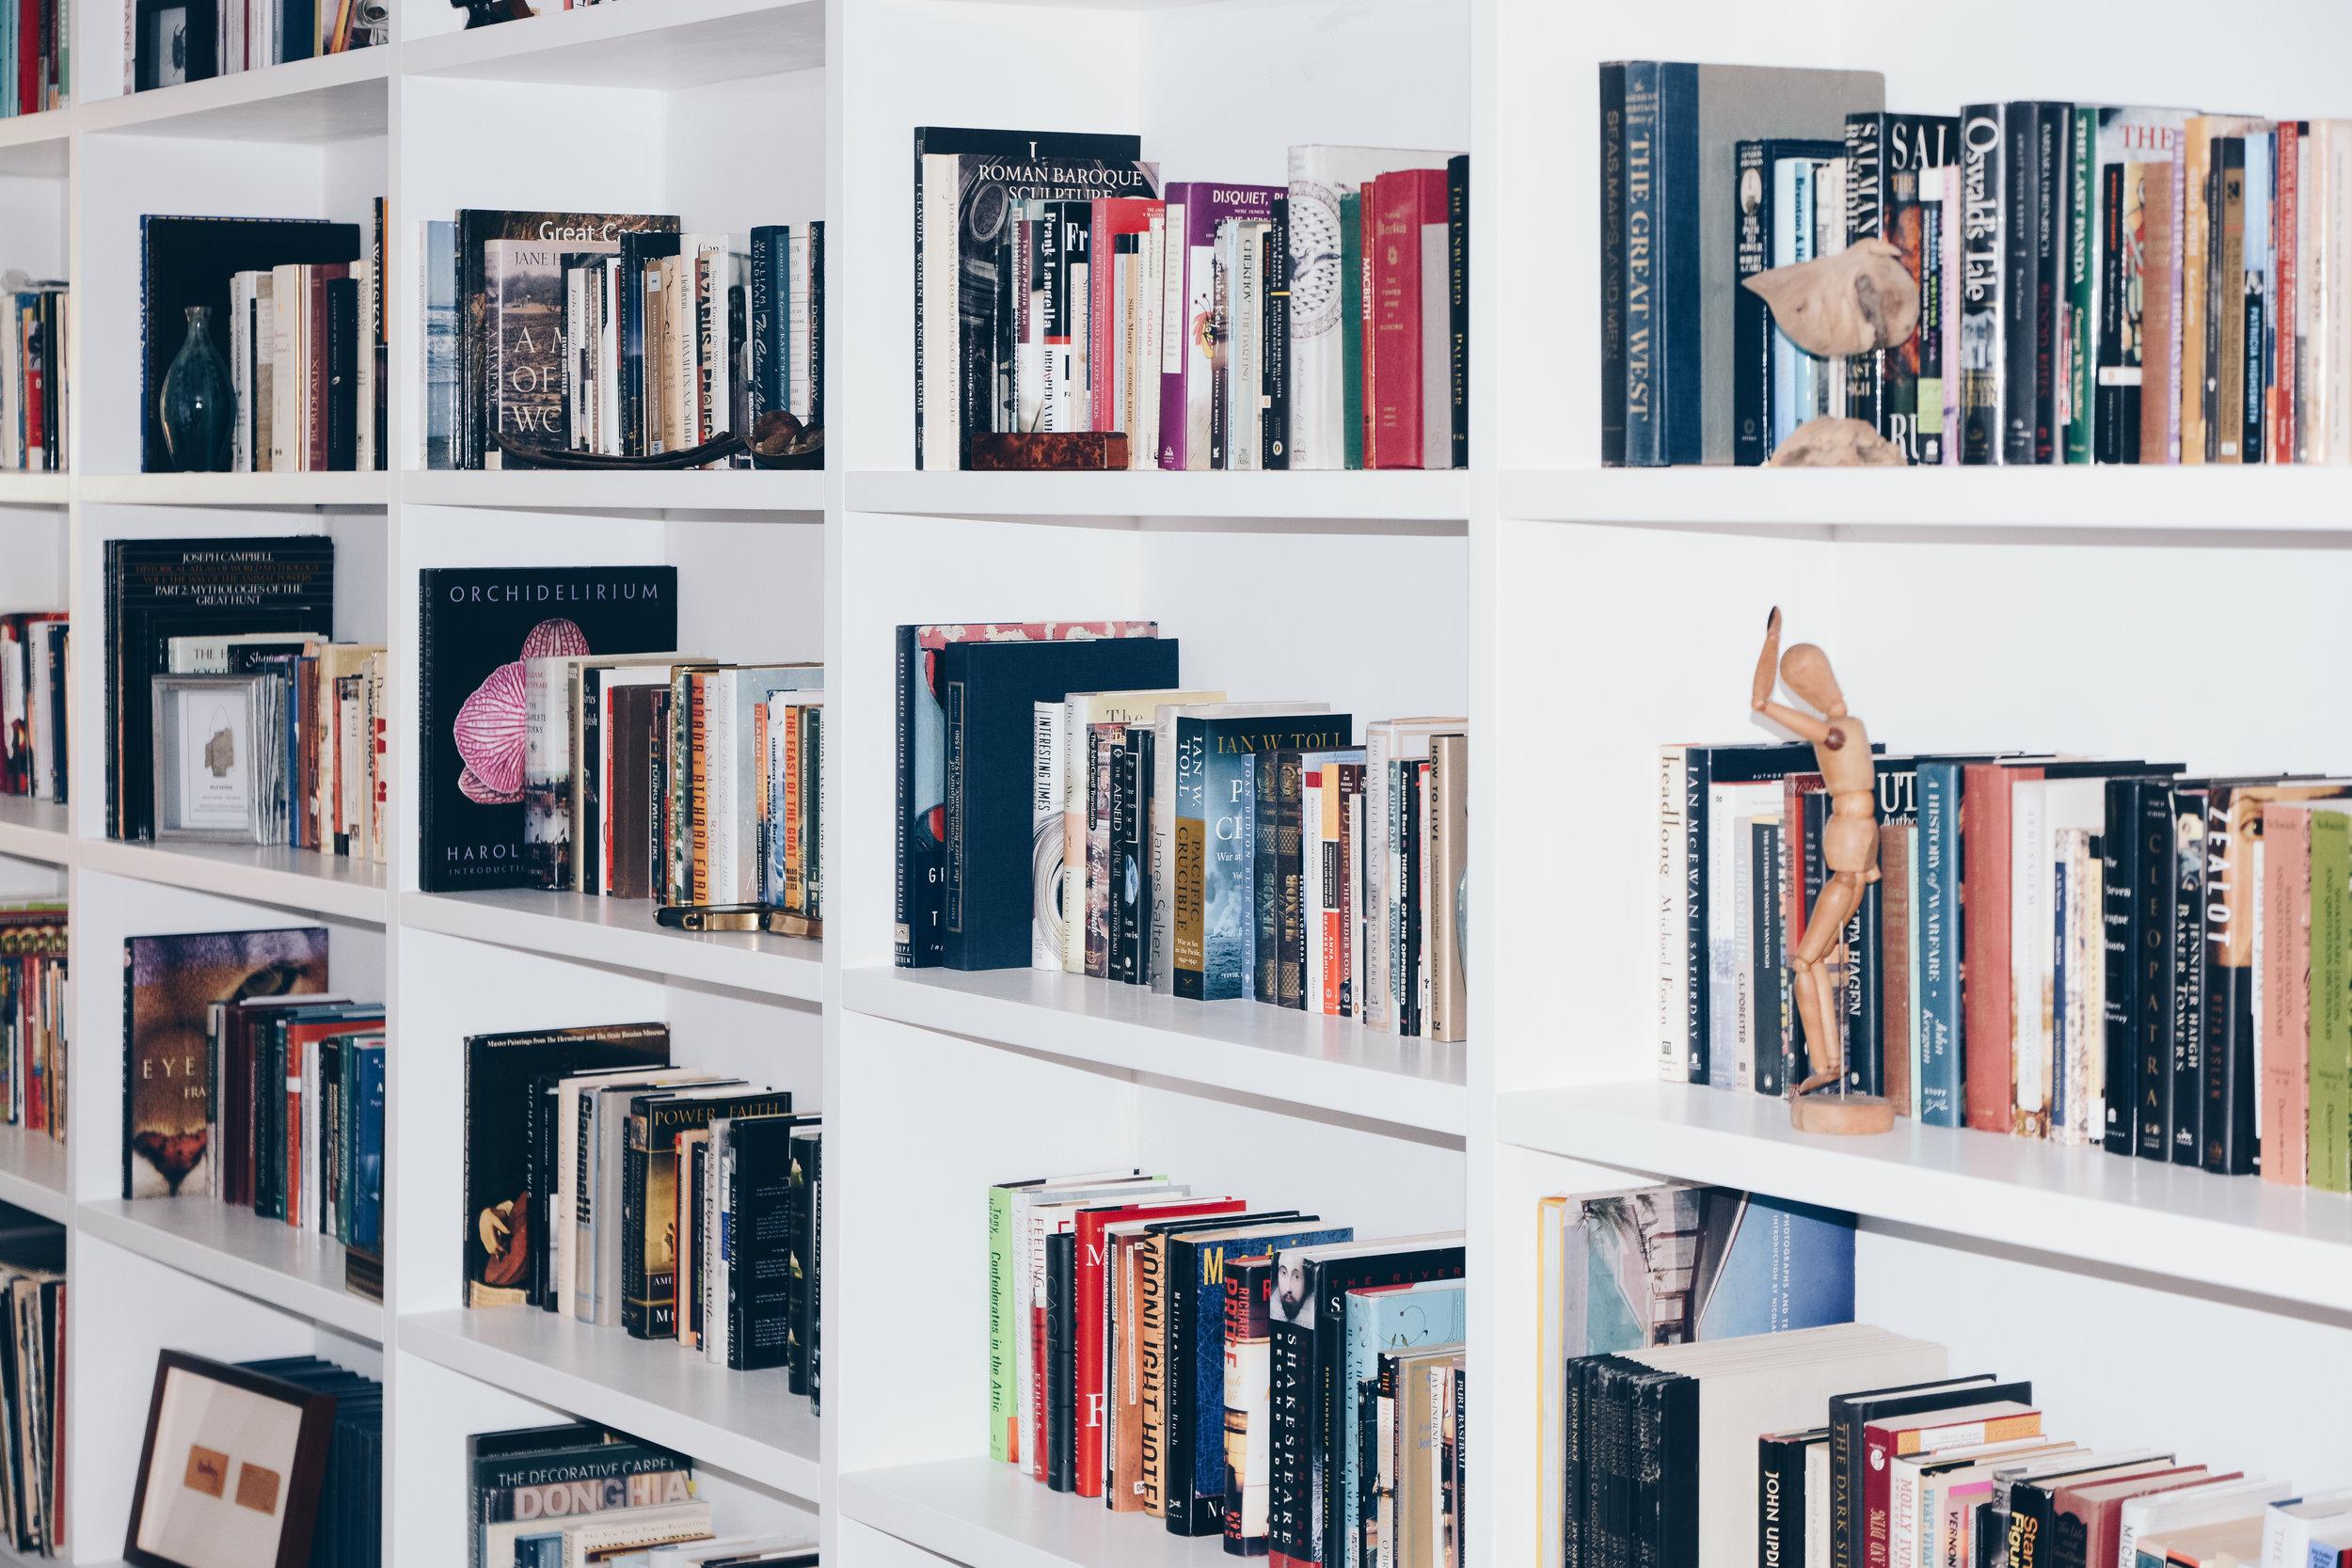 Openbookcasecustommade.jpg